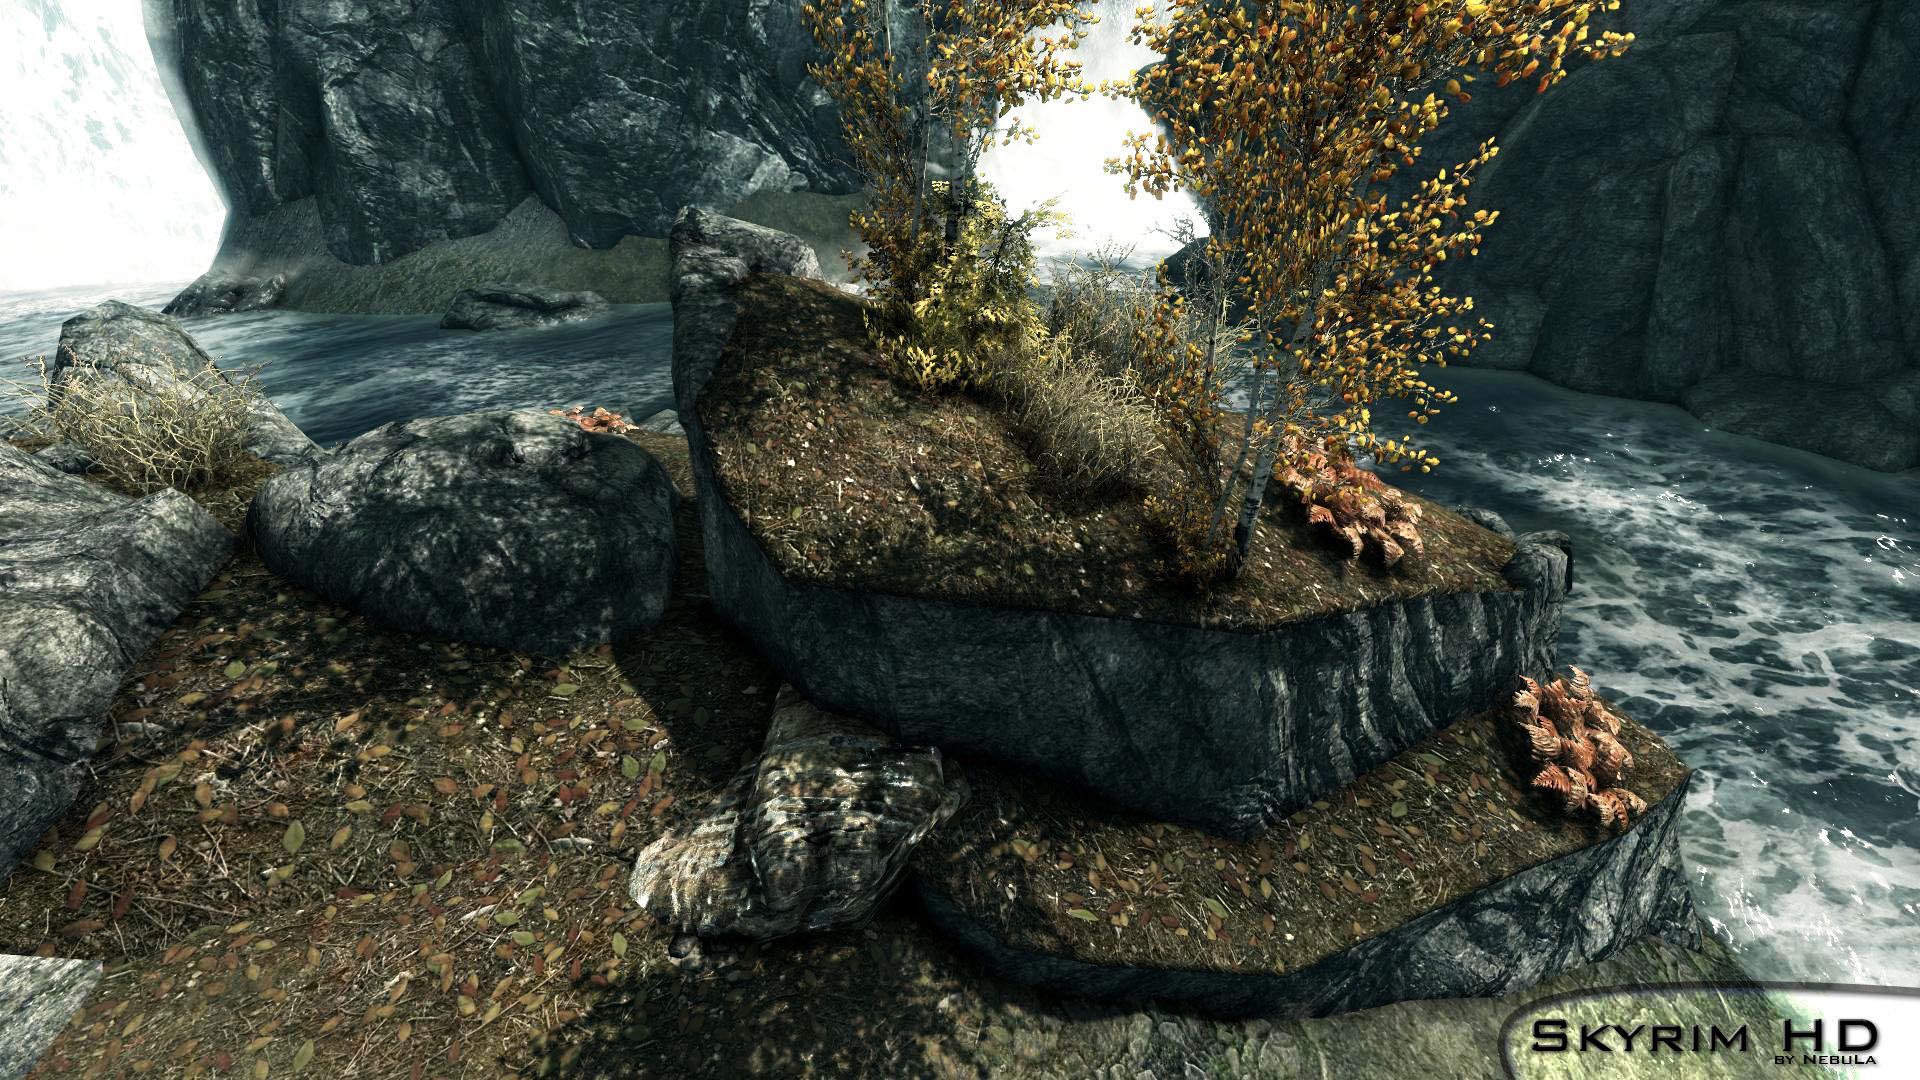 Skyrim HD | The Escapist